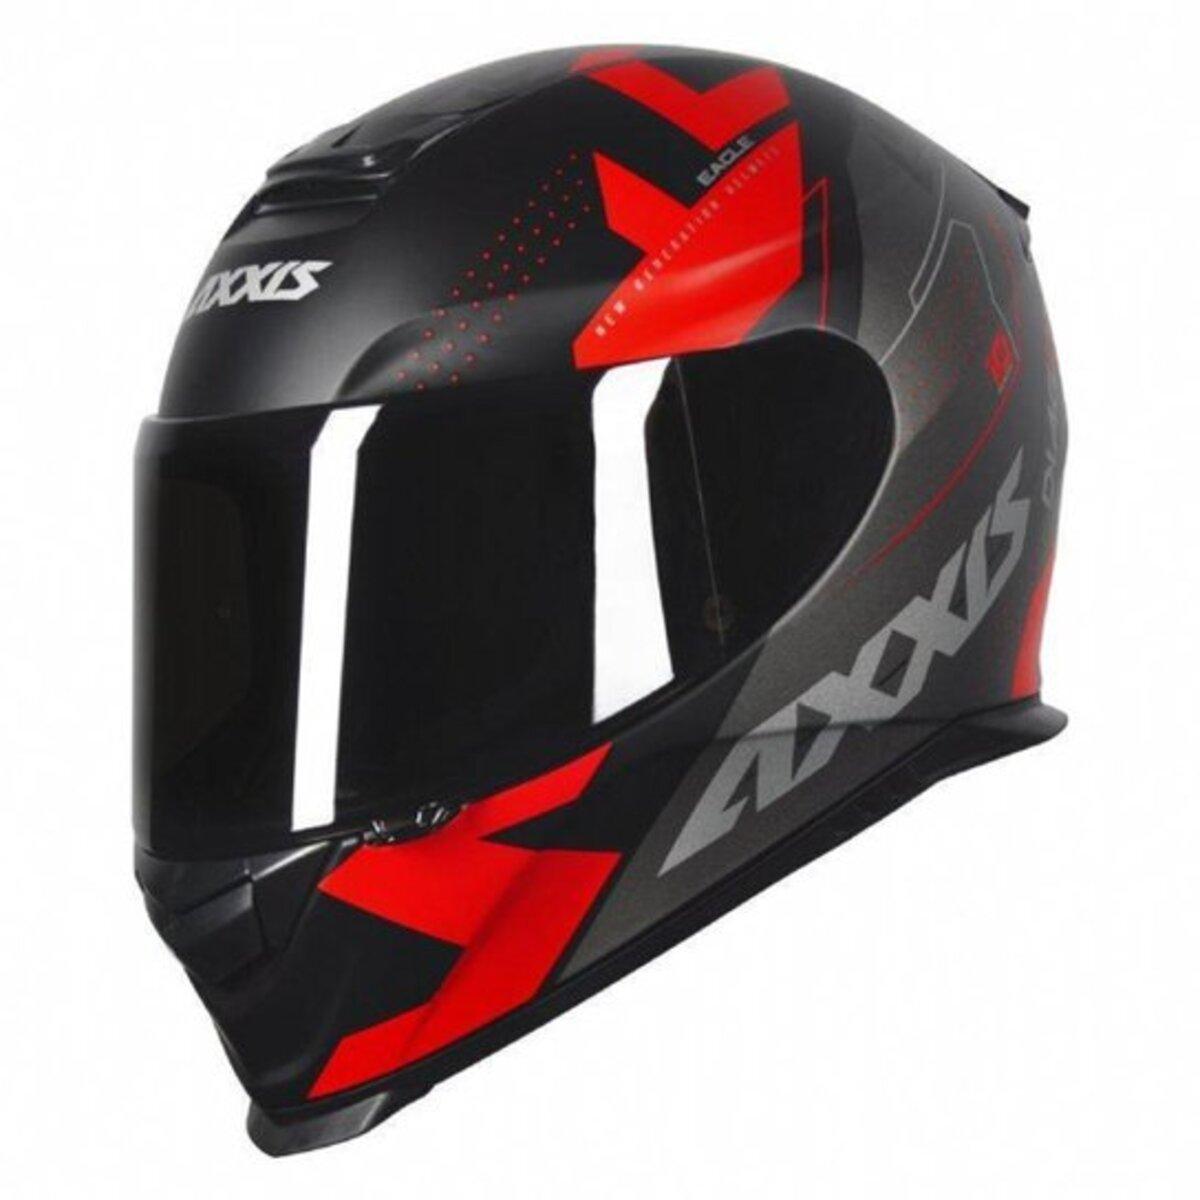 CAPACETE AXXIS EAGLE DIAGON MATTE BLACK/RED 60/L